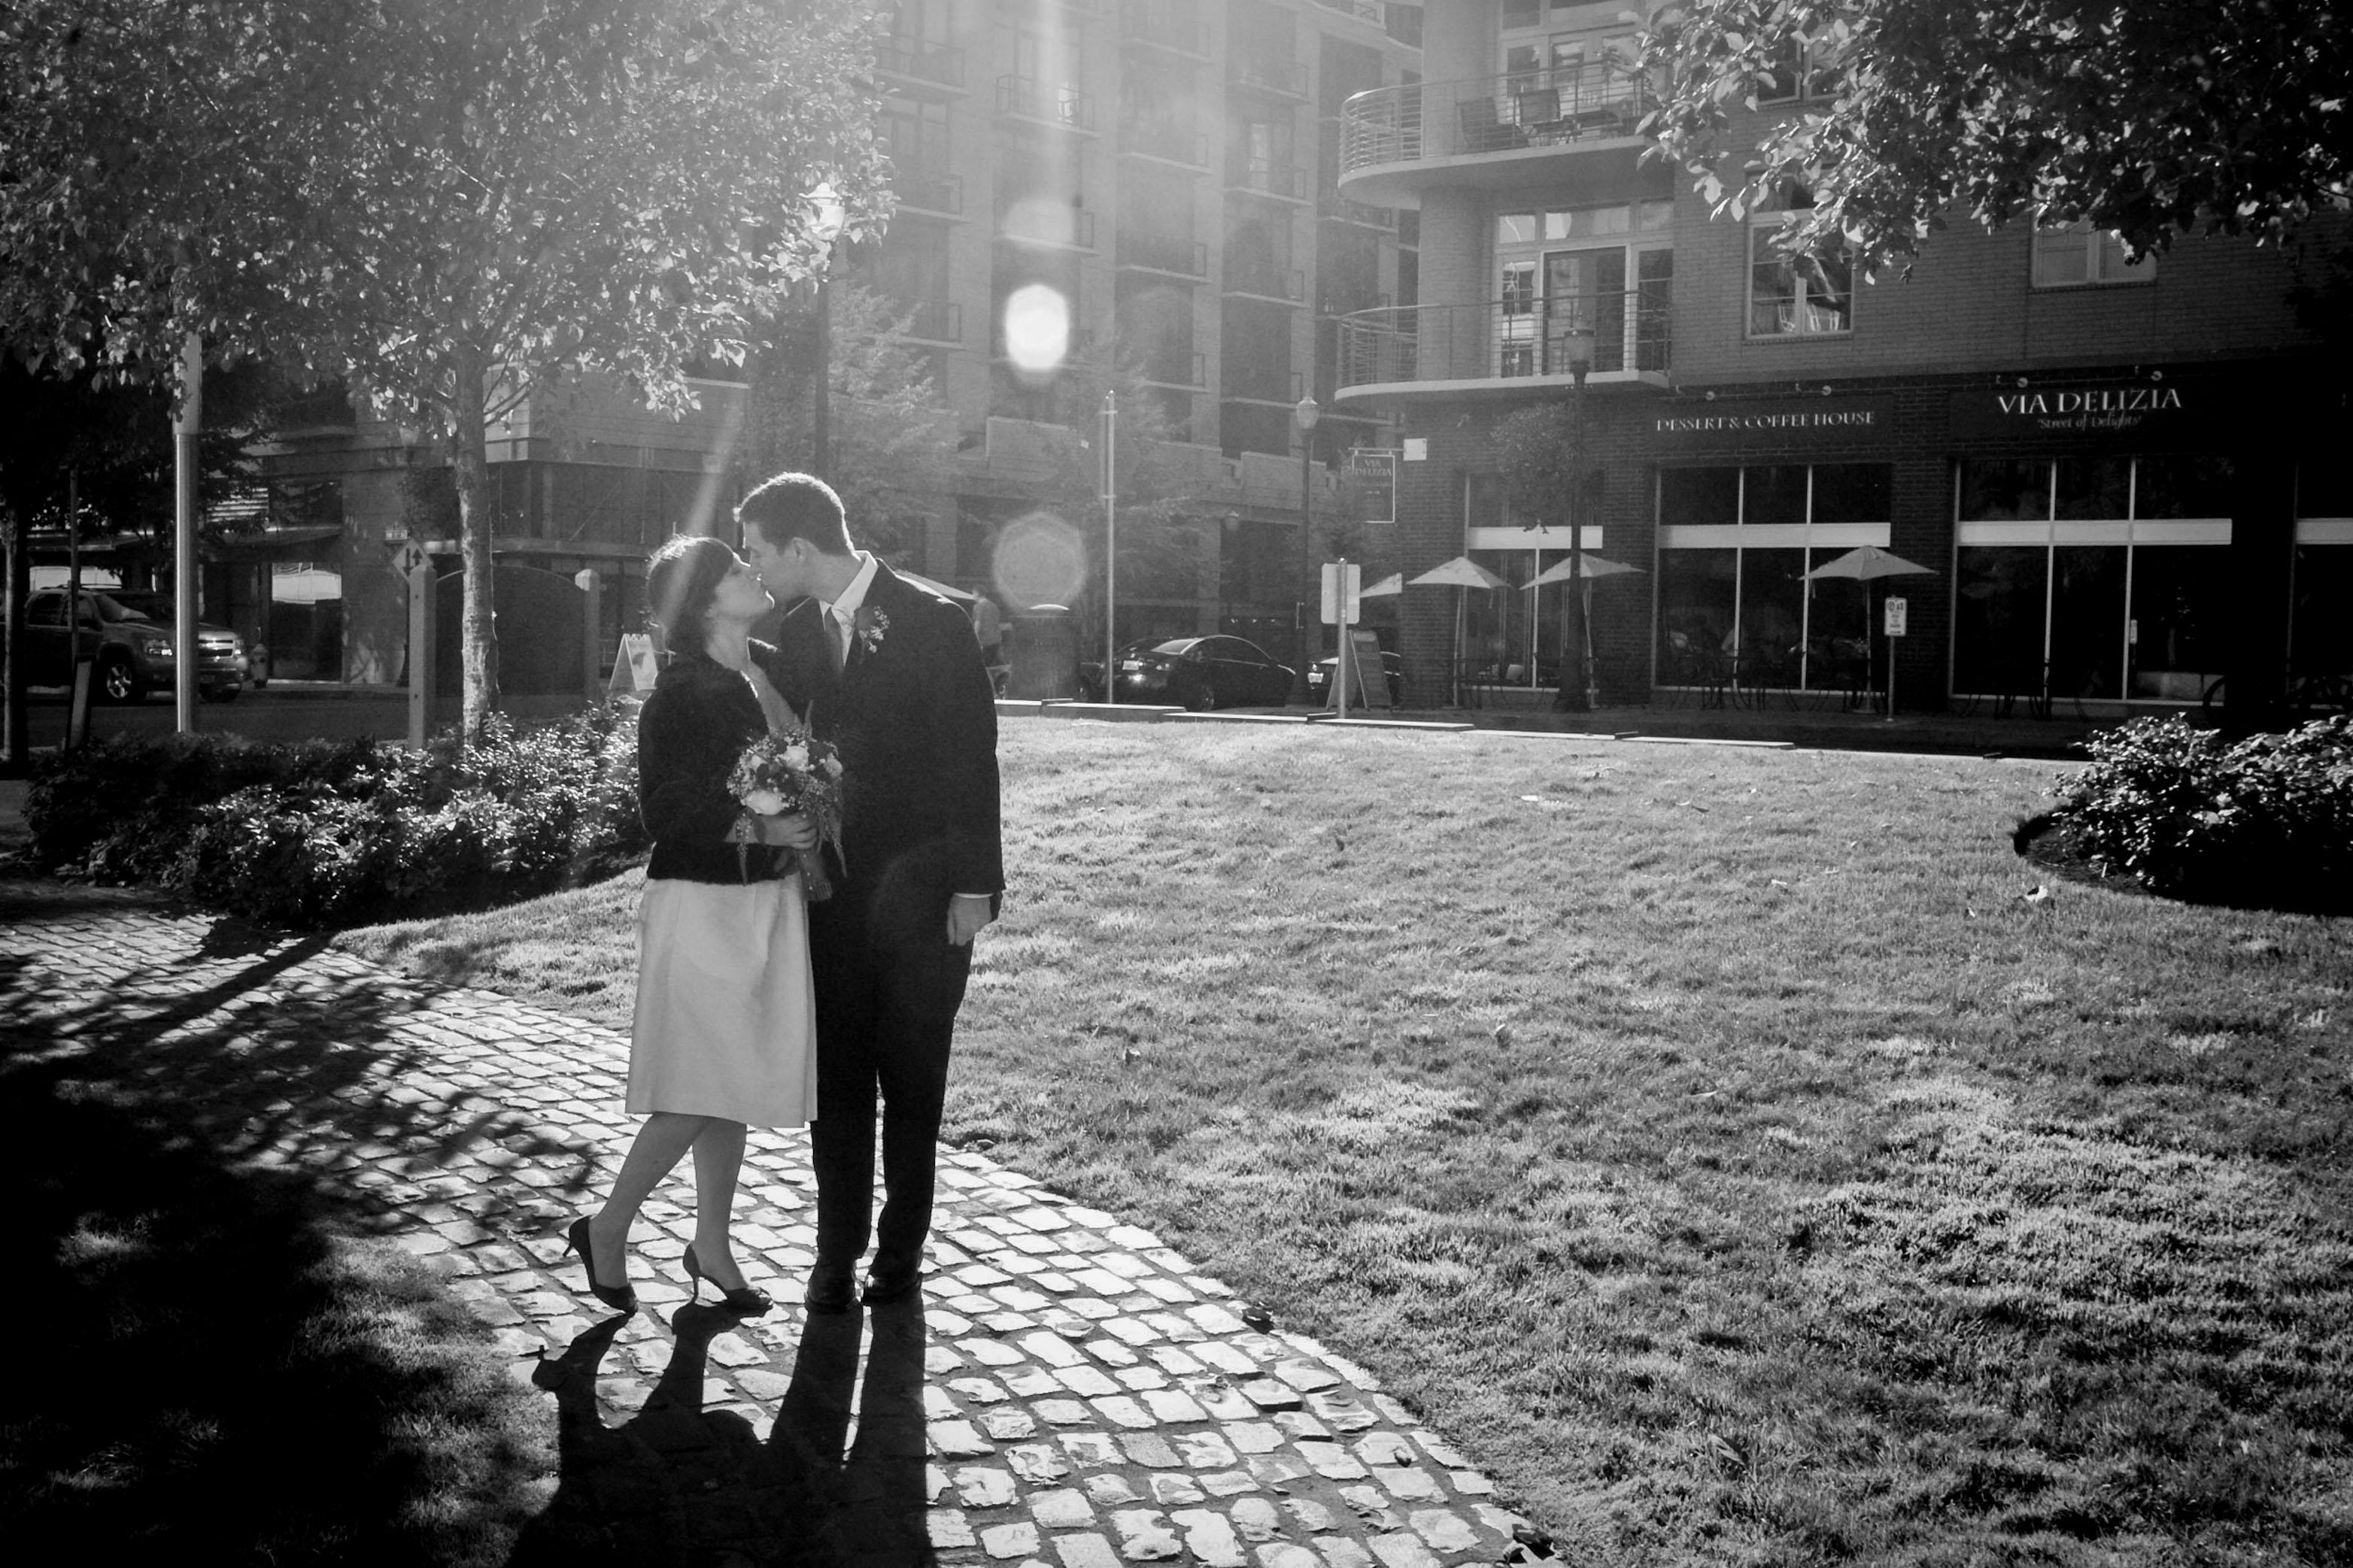 downtown-portland-or-wedding-kiss